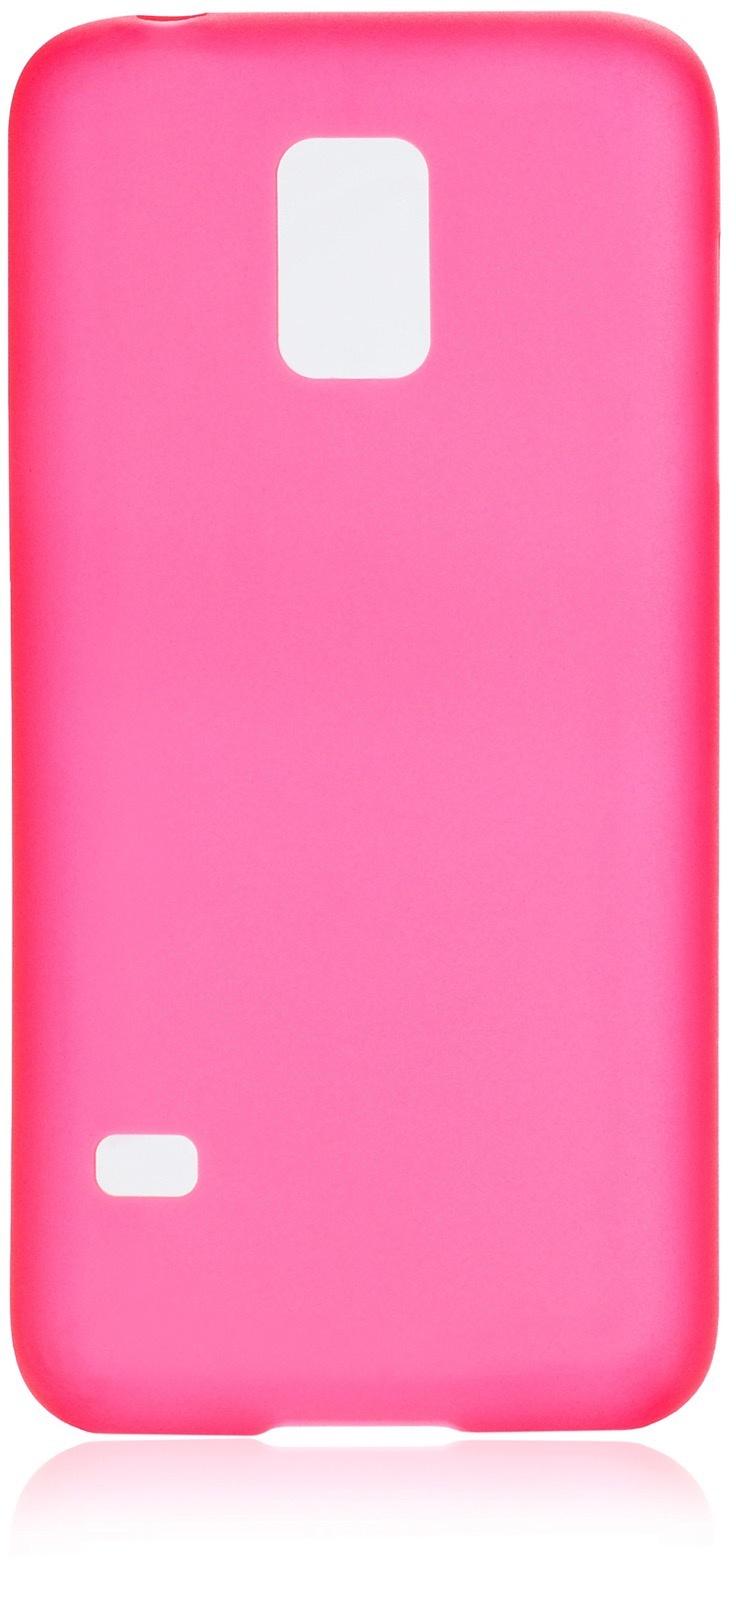 Чехол накладка iNeez пластик 0.3мм 570010 для Samsung Galaxy S5 mini,570010, красный